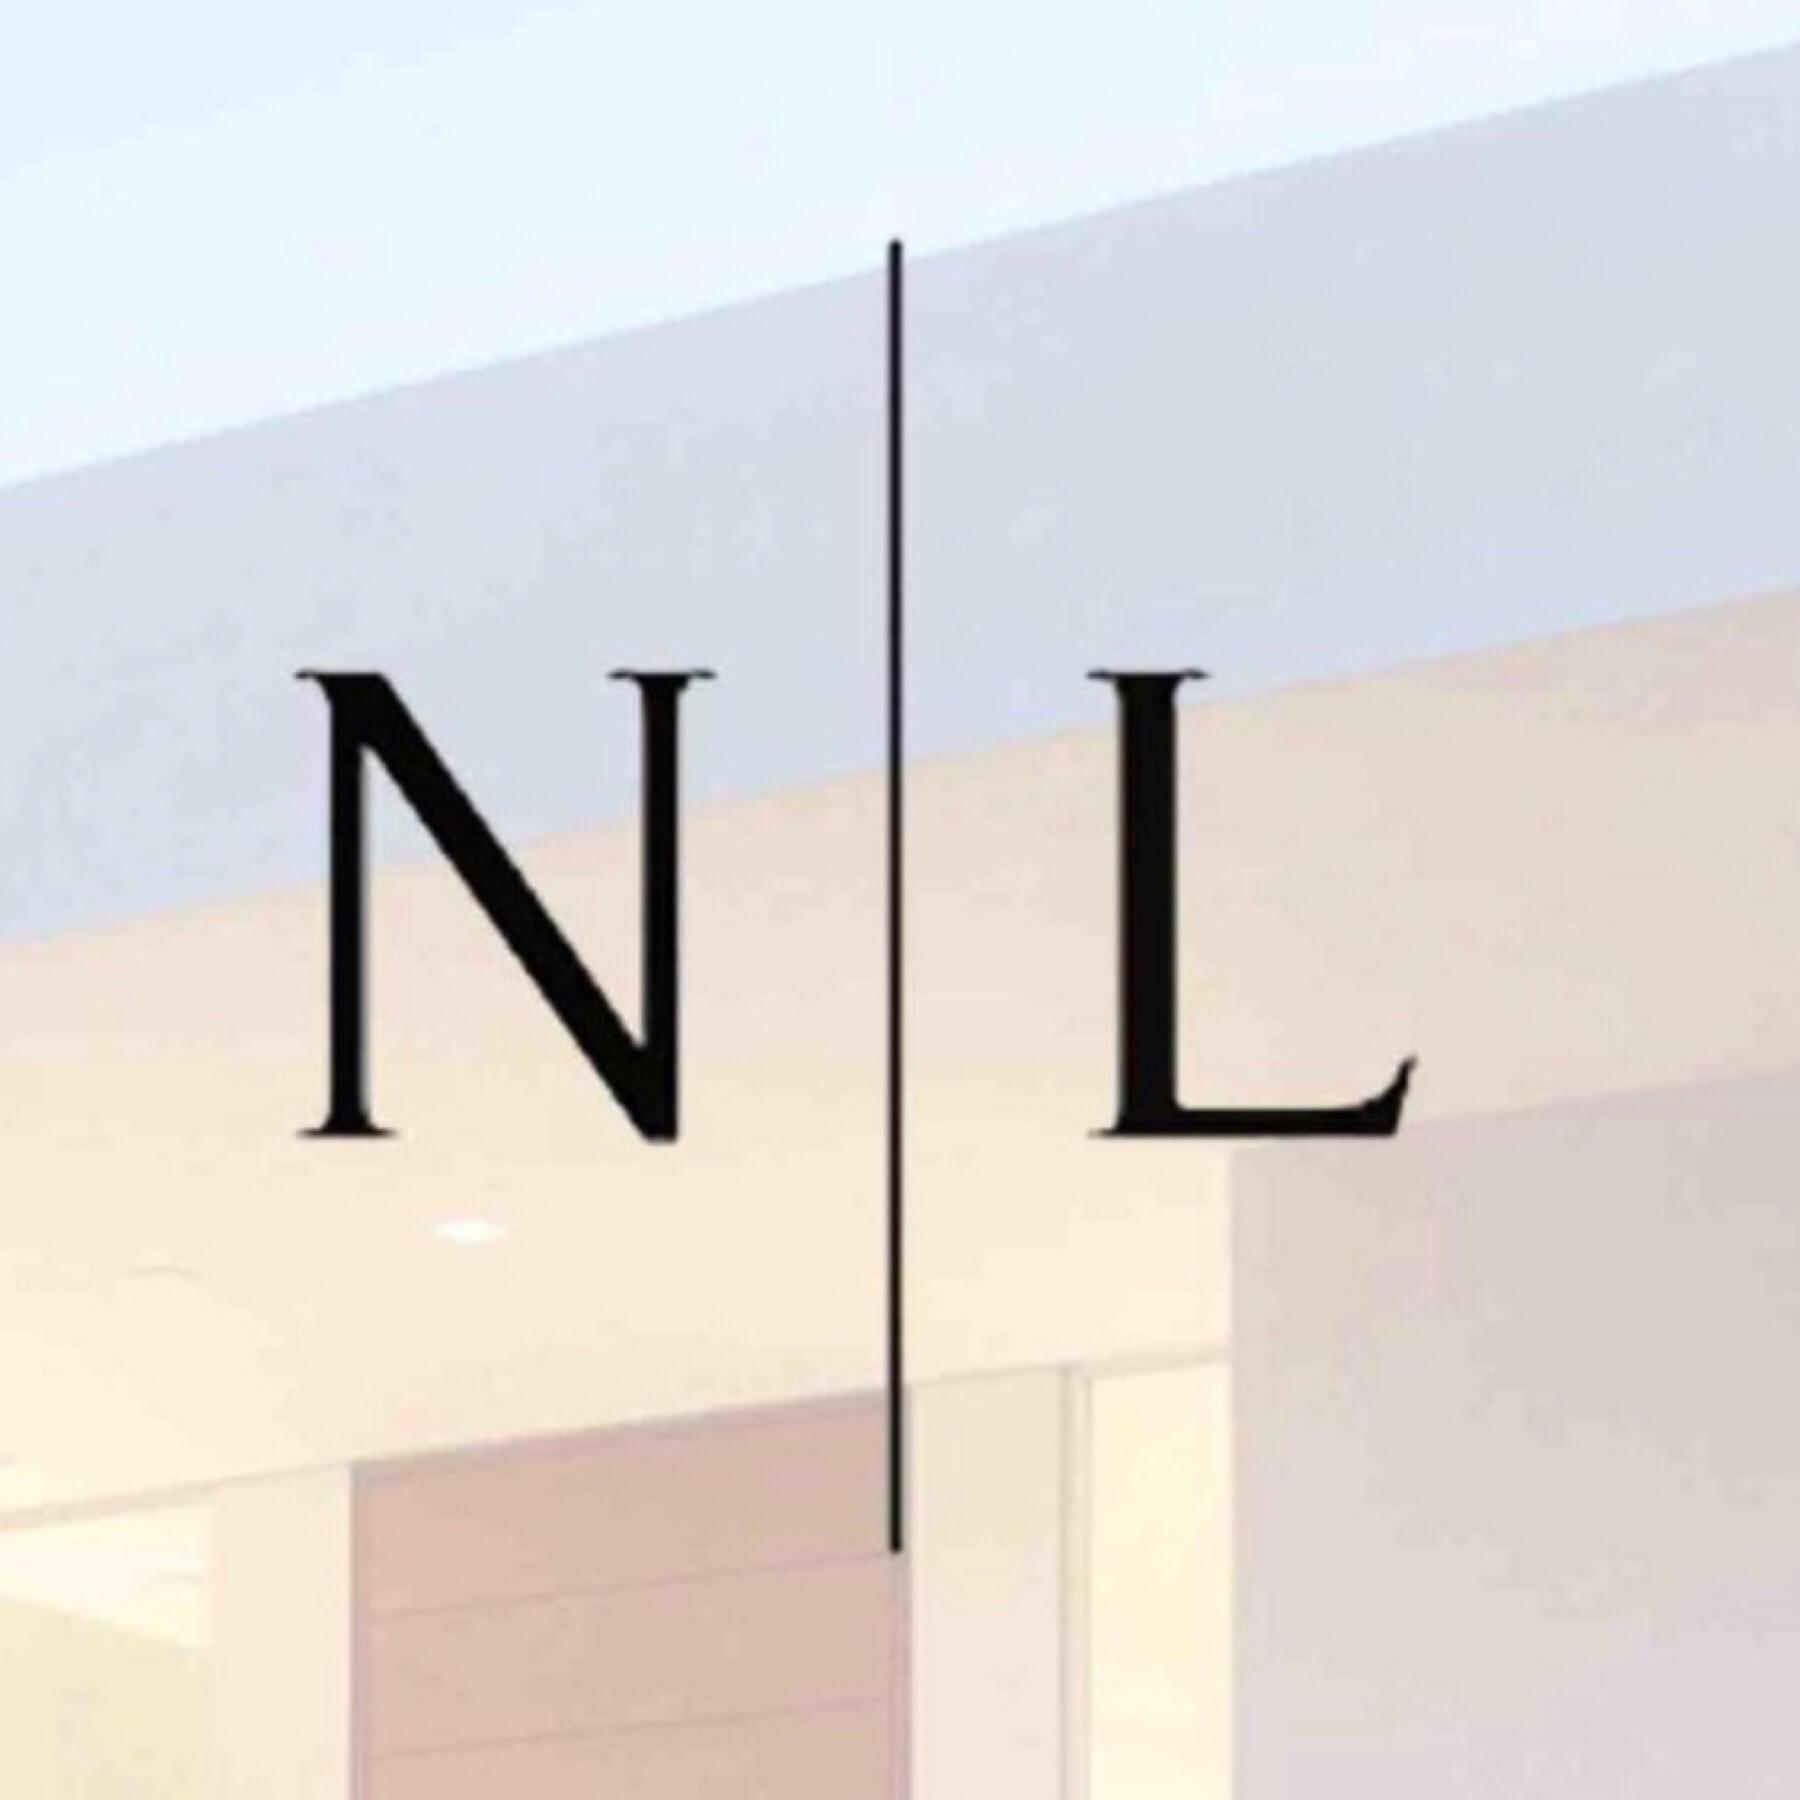 ByNL.jpg